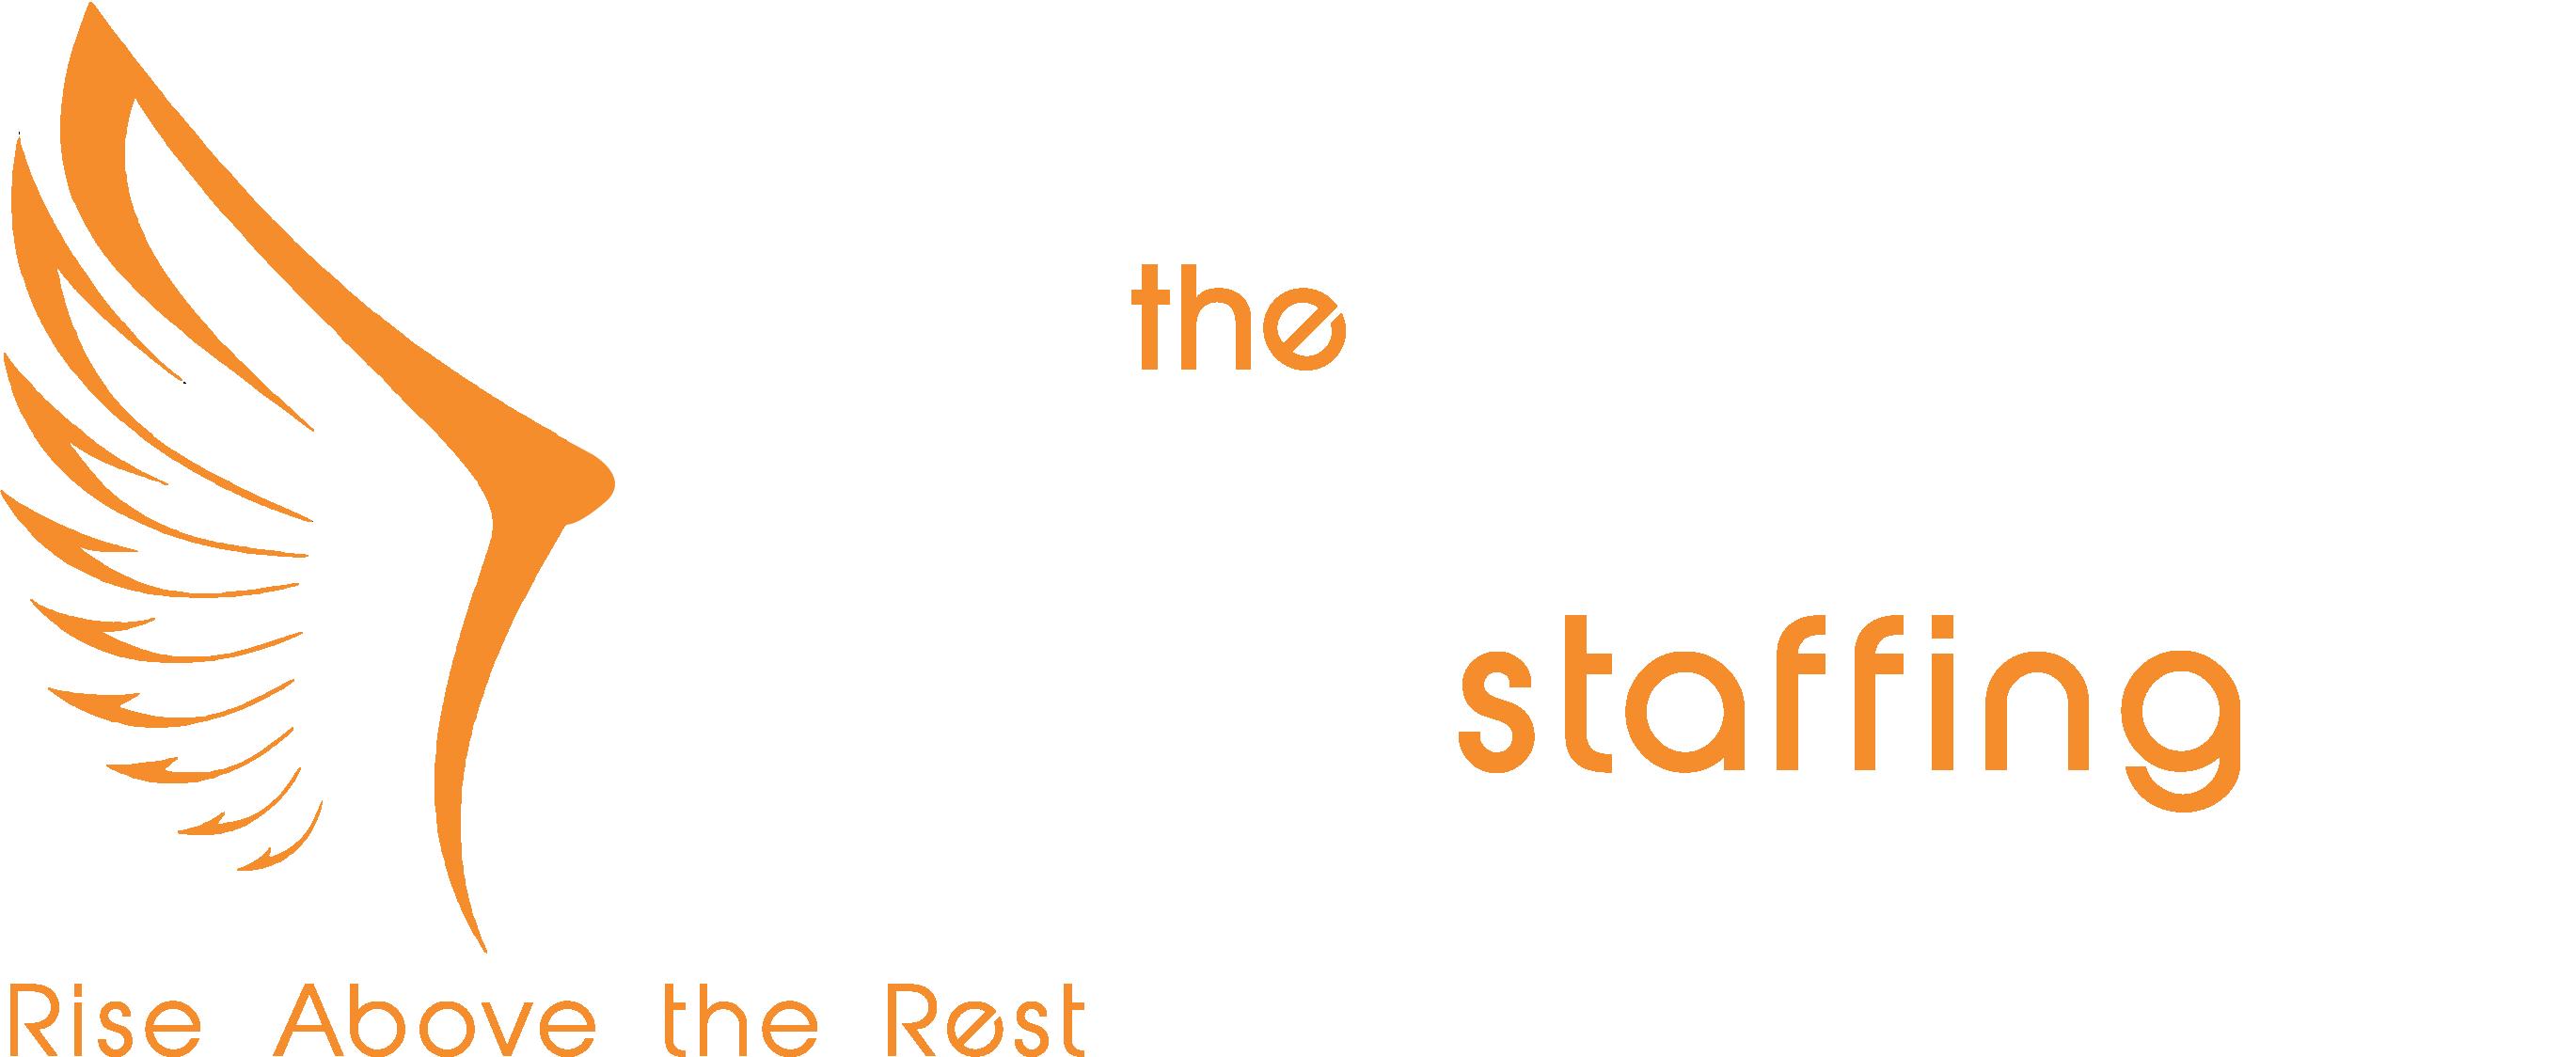 The Phoenix Staffing